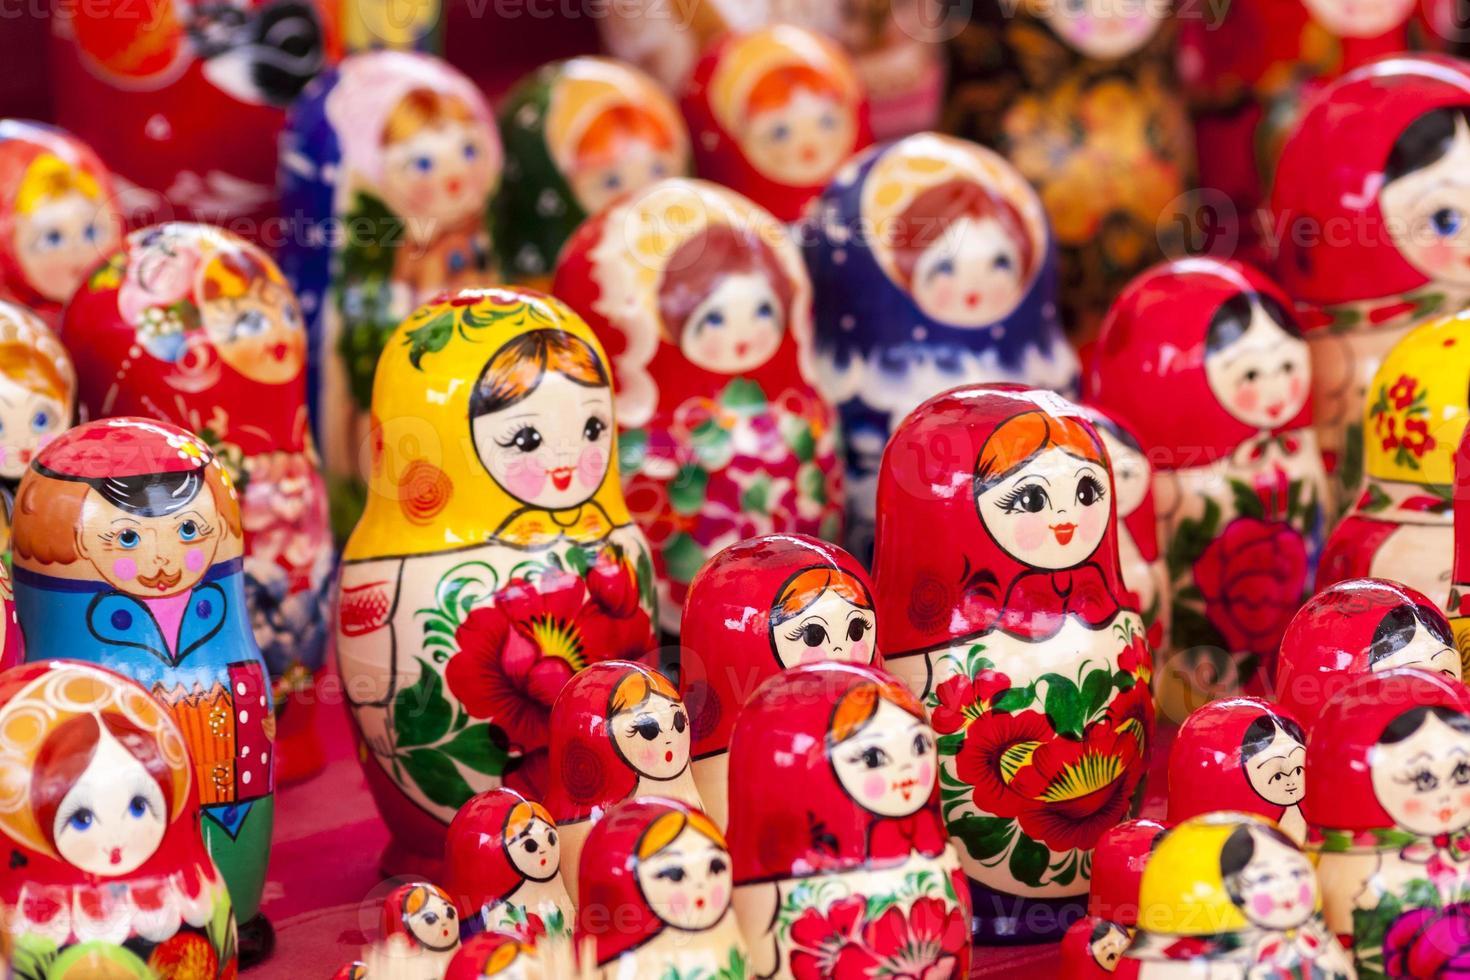 Russische Oekraïense poppen foto